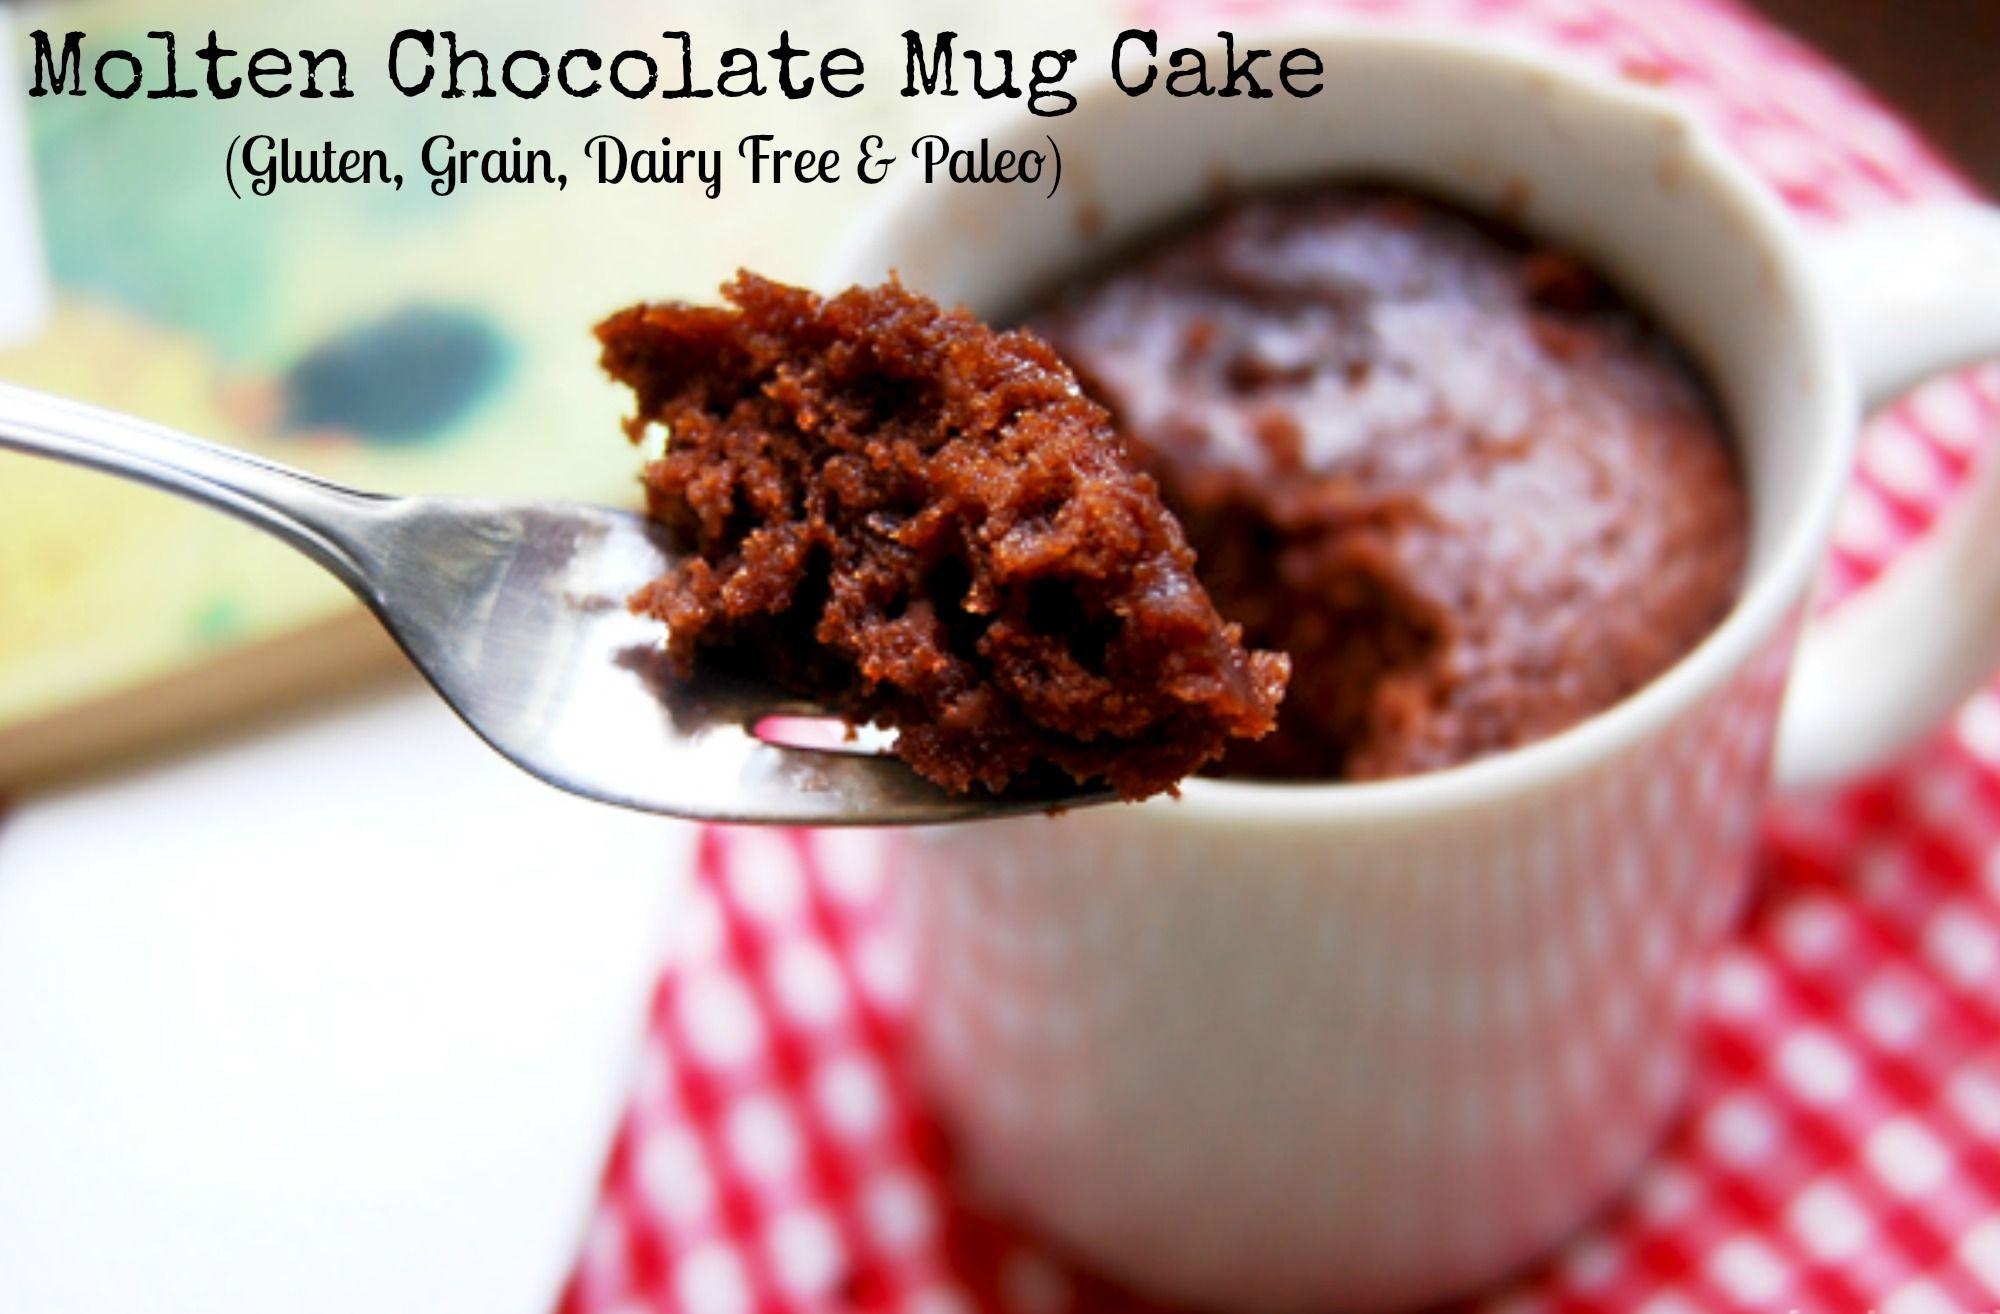 Realizing Vitality:  Molten Chocolate Mug Cake (Gluten, Grain, Dairy Free & Paleo)